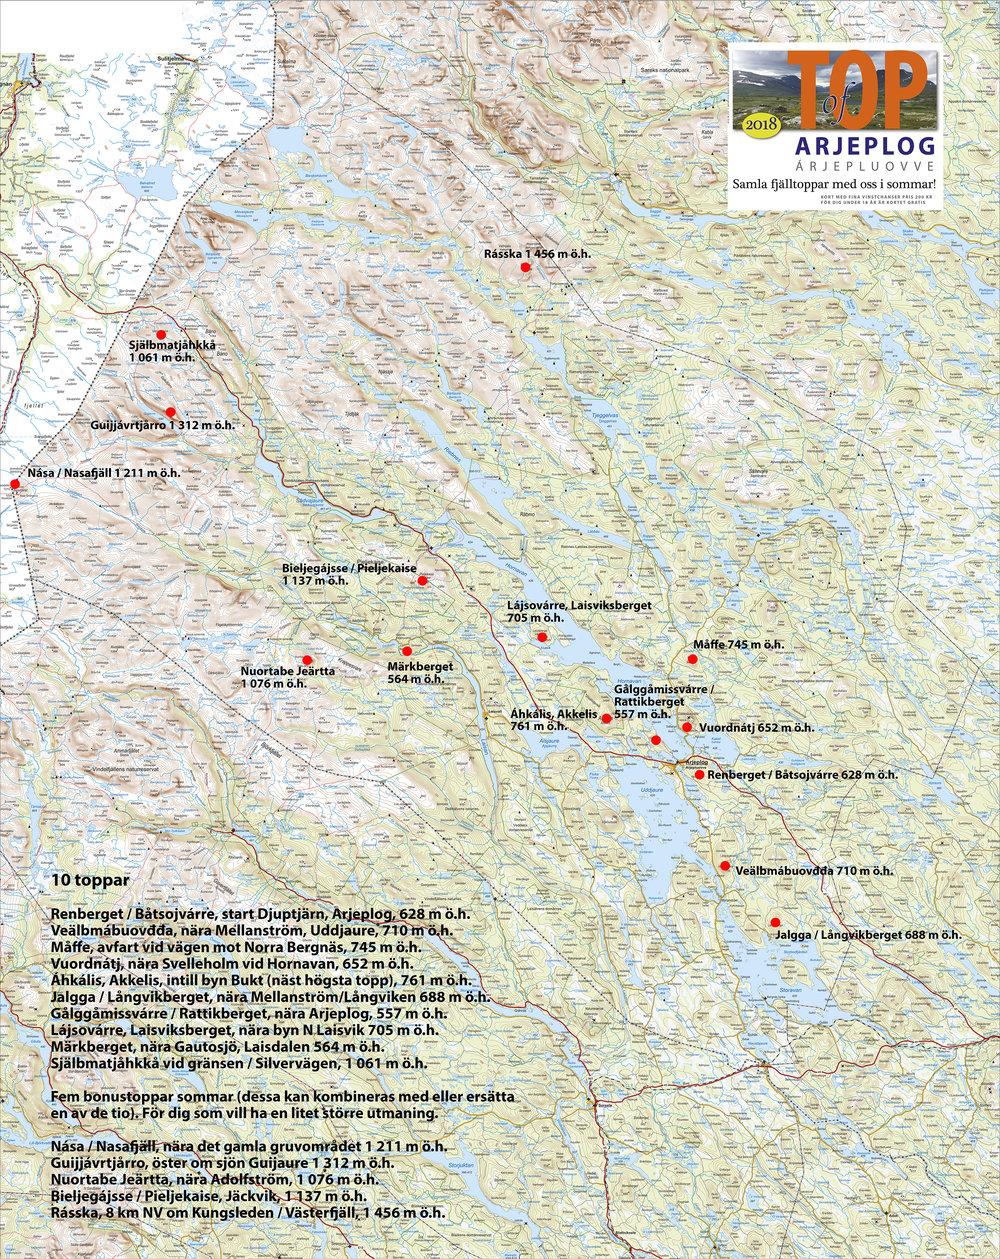 hemsida Karta Top of Arjeplog 2018 Arjeplog_kommun metria.jpg